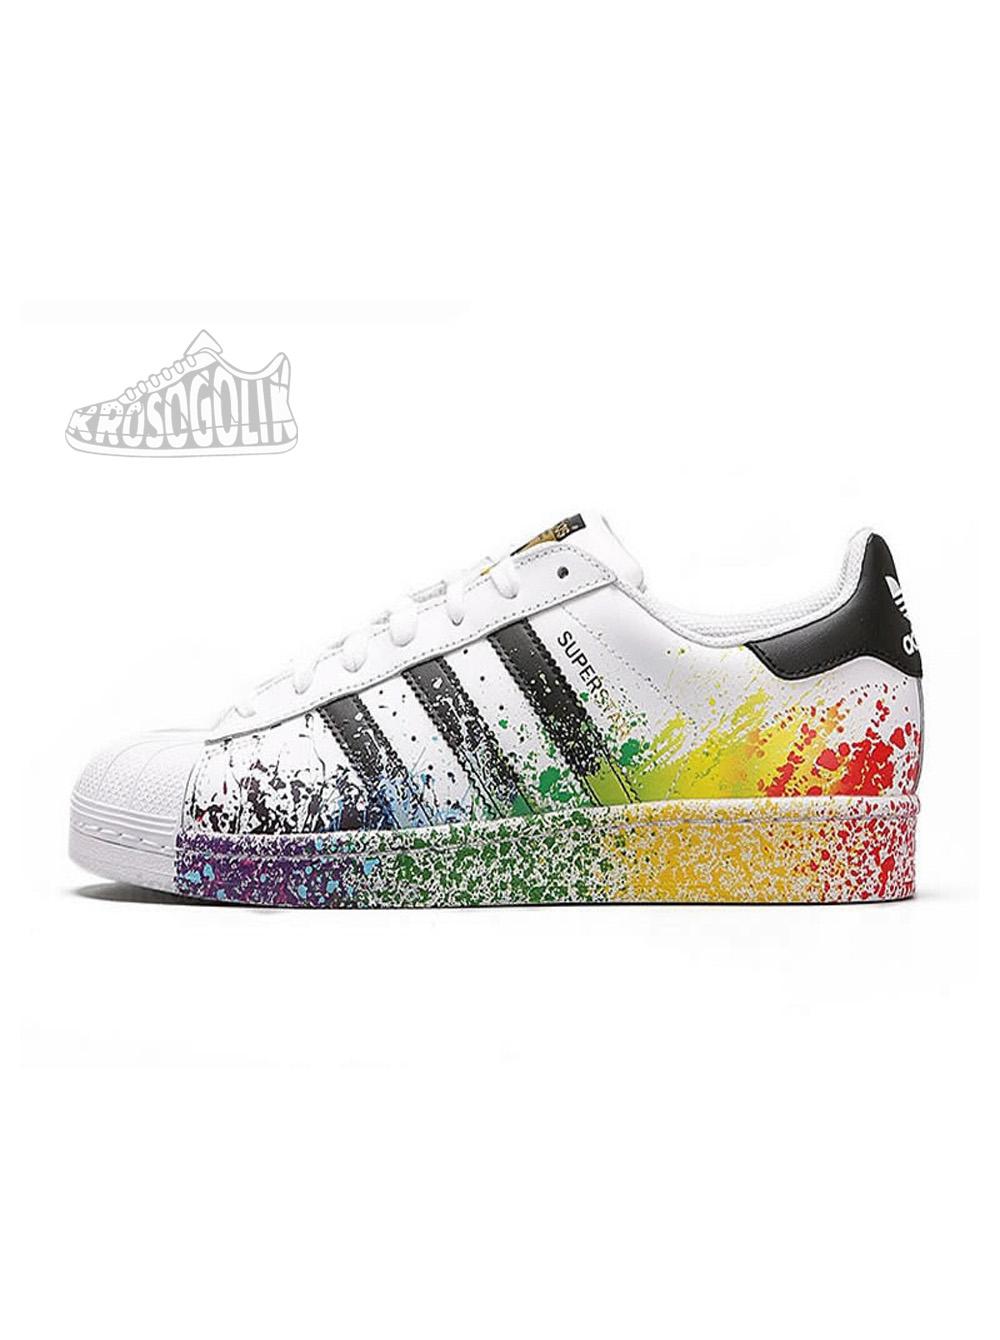 meet 11494 55e66 Adidas Superstar Splash Sneakers Multi Color